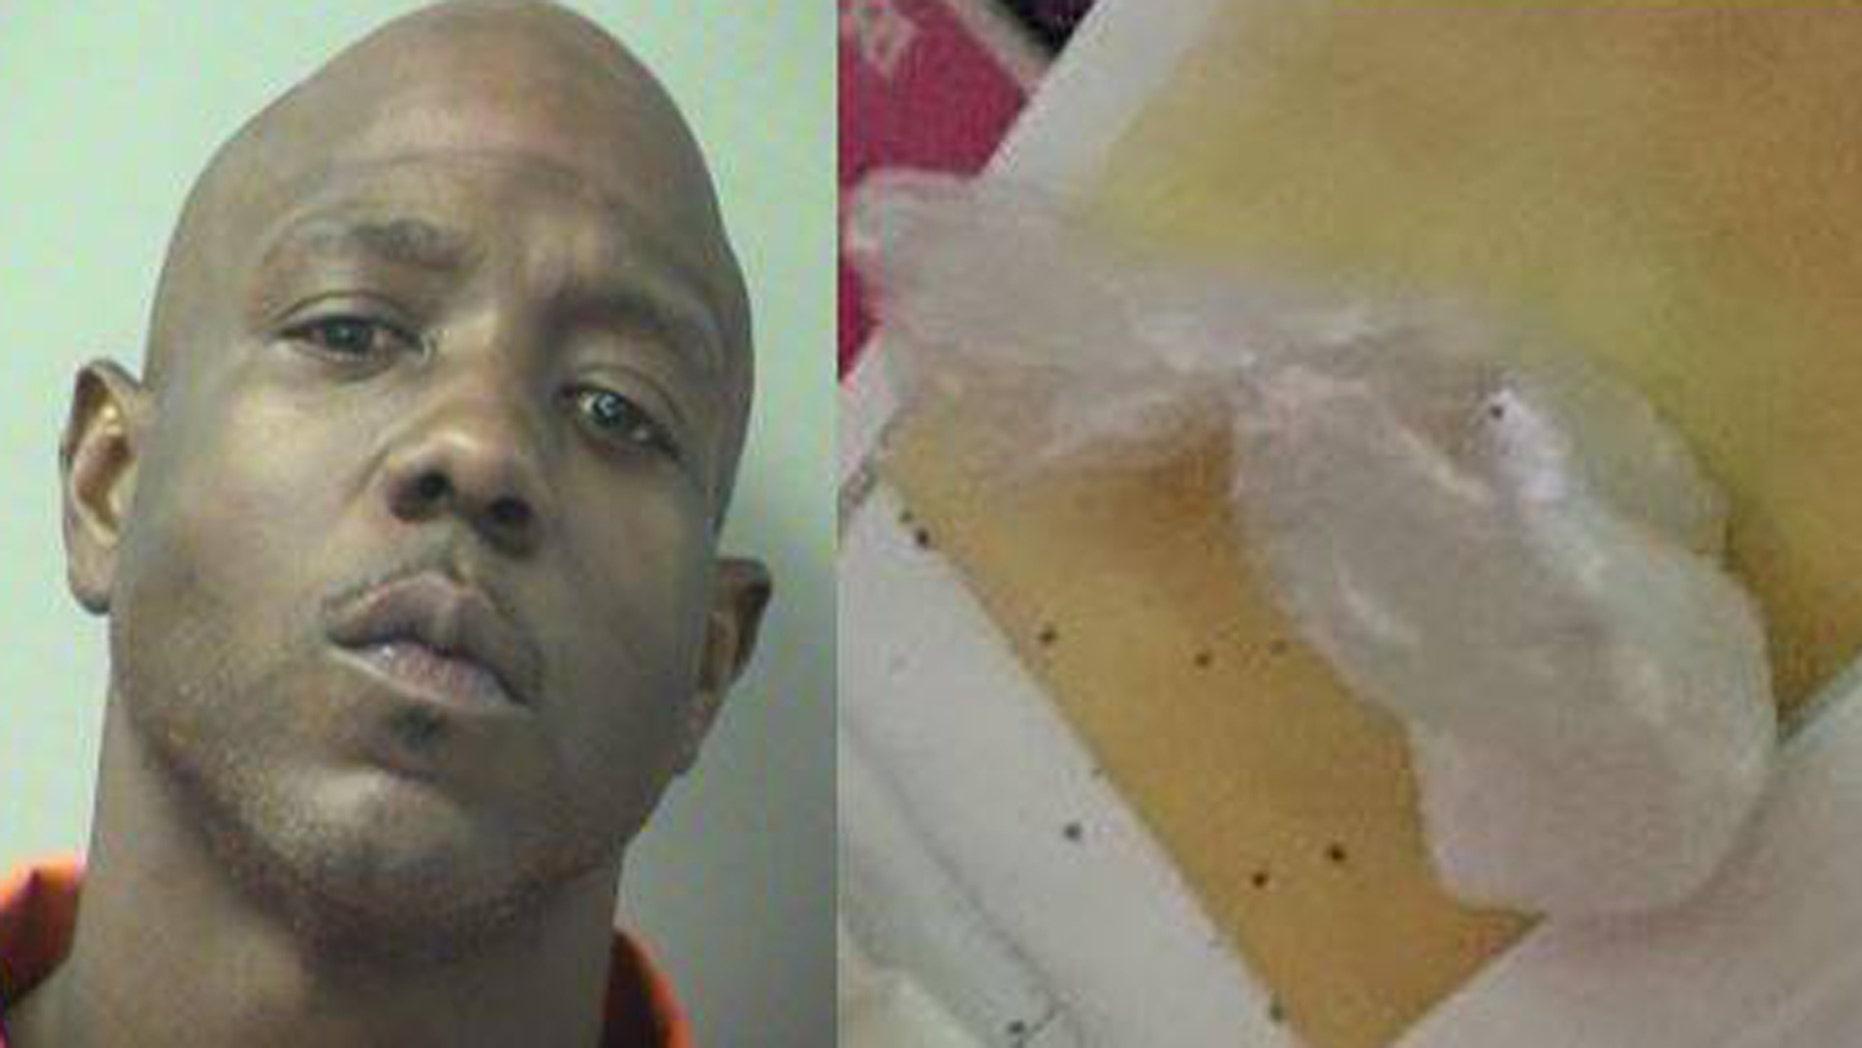 Self-described Florida drug dealer calls 911, reports stolen cocaine